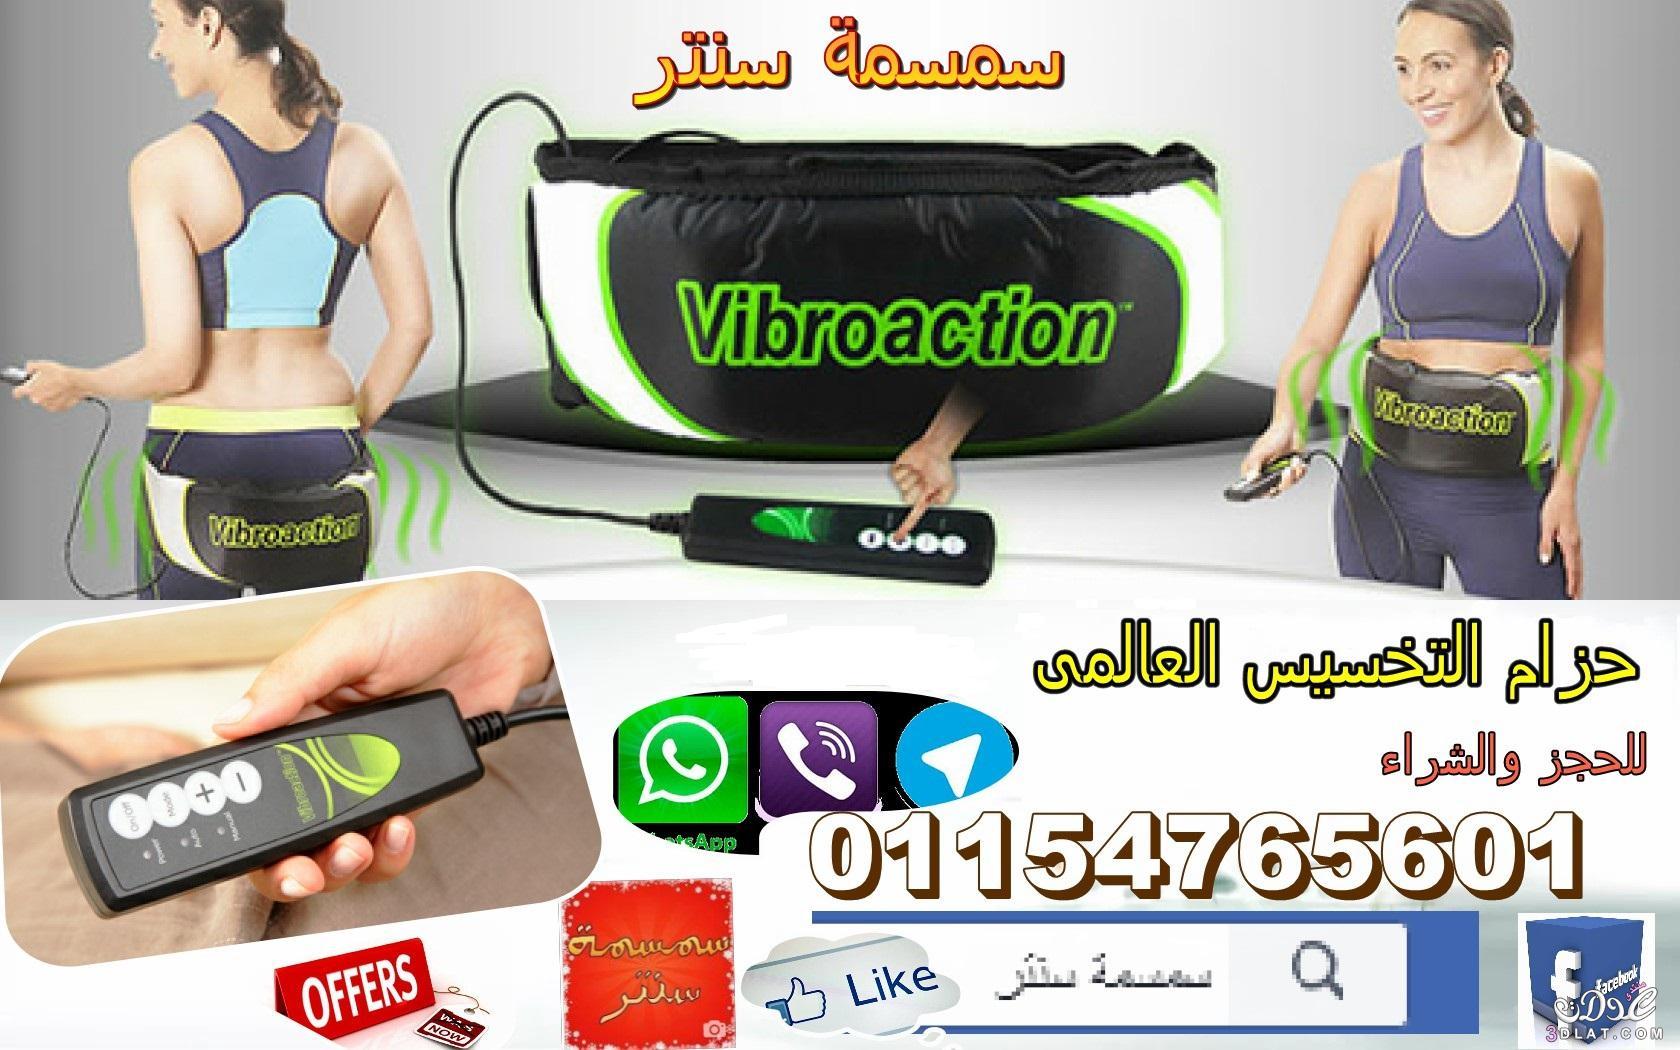 vibroaction فايبرو اكشن حزام التخسيس الرهيب 3dlat.net_15_17_c0cb